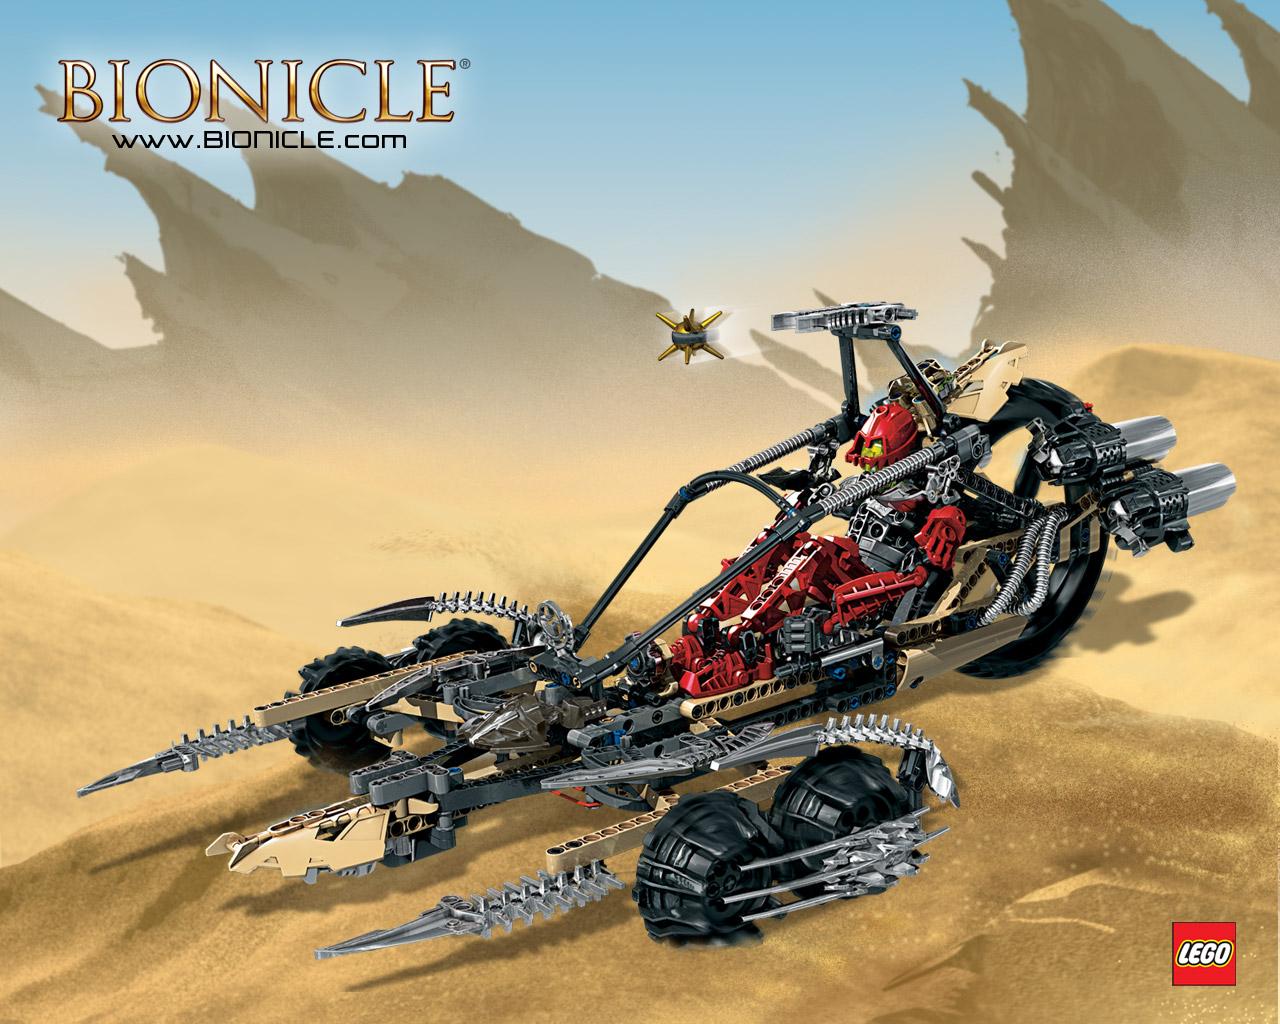 thornatus the bionicle wiki fandom powered by wikia